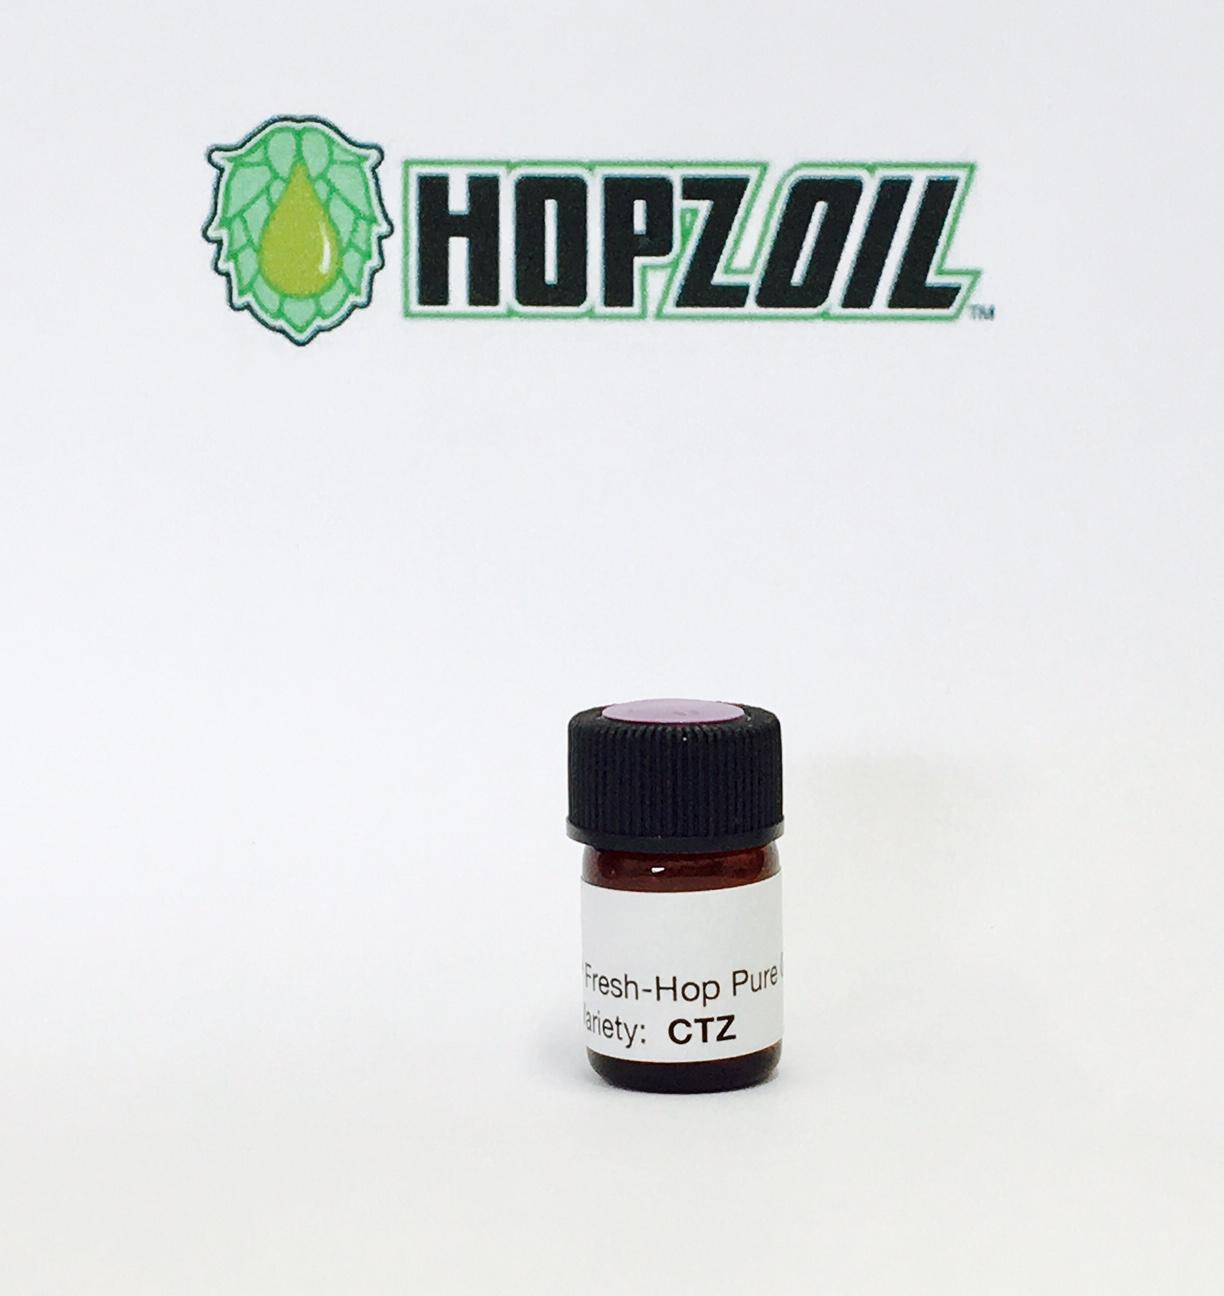 Aceite de lúpulo hopzoil columbus